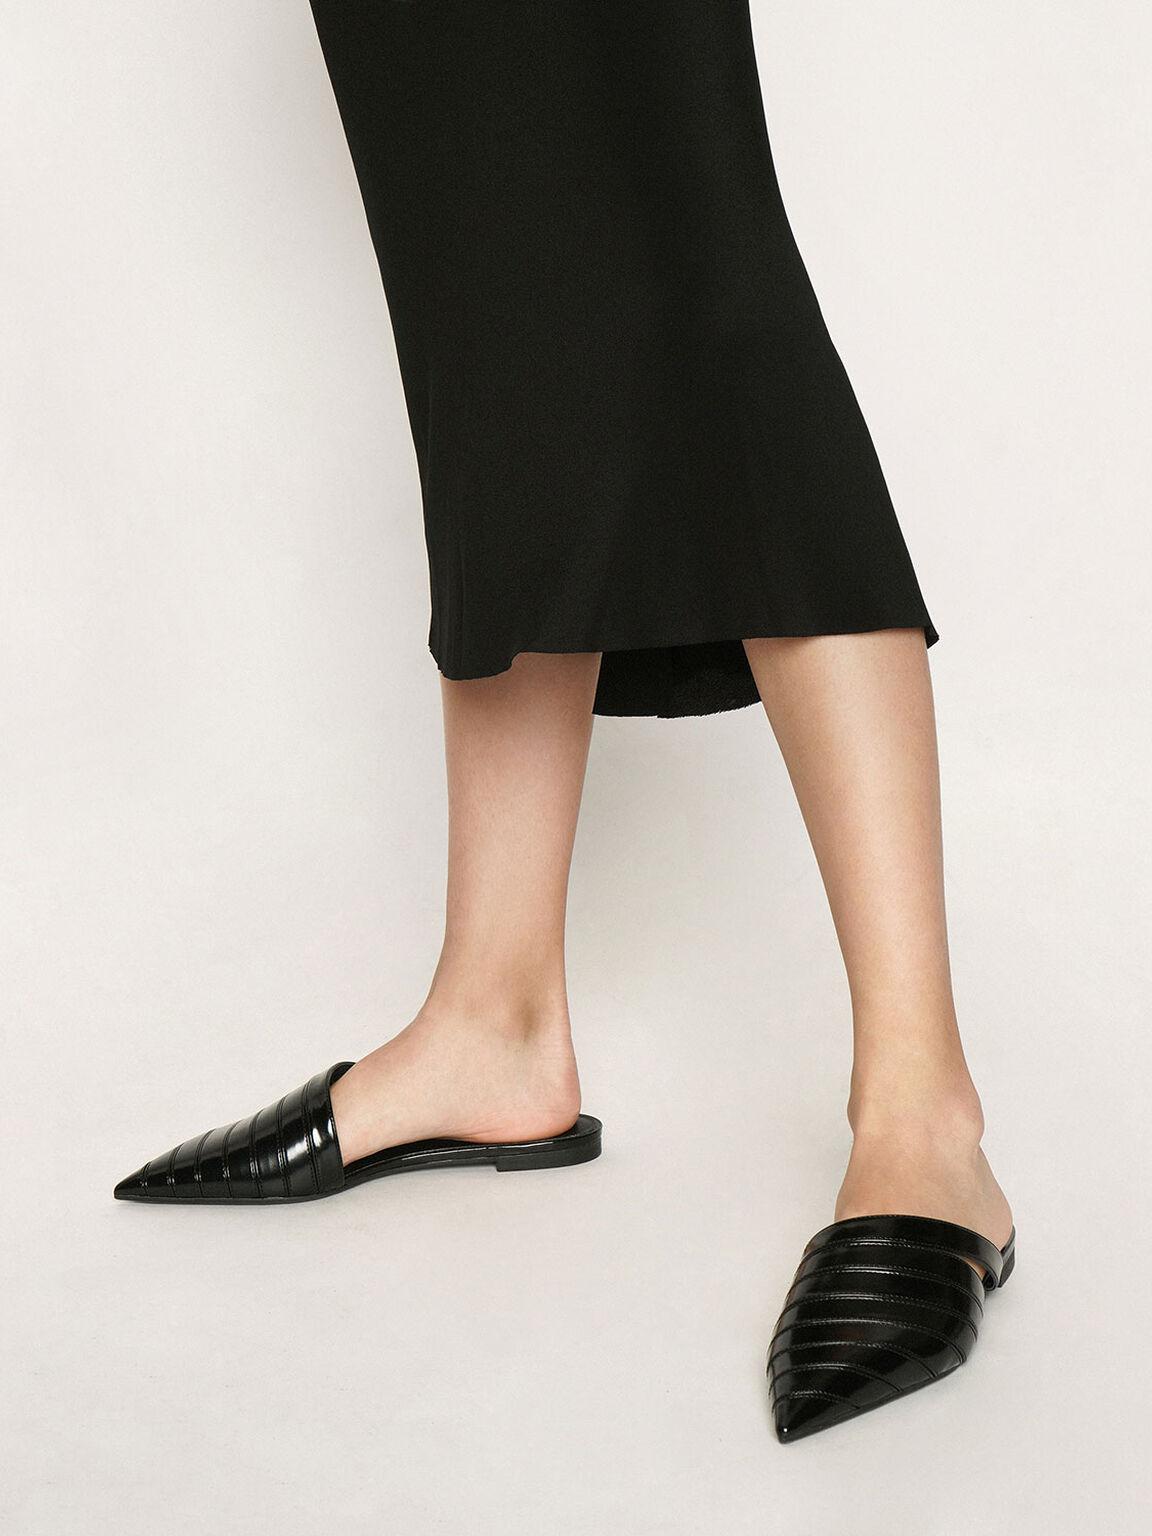 Asymmetric Pointed Toe Mules, Black, hi-res